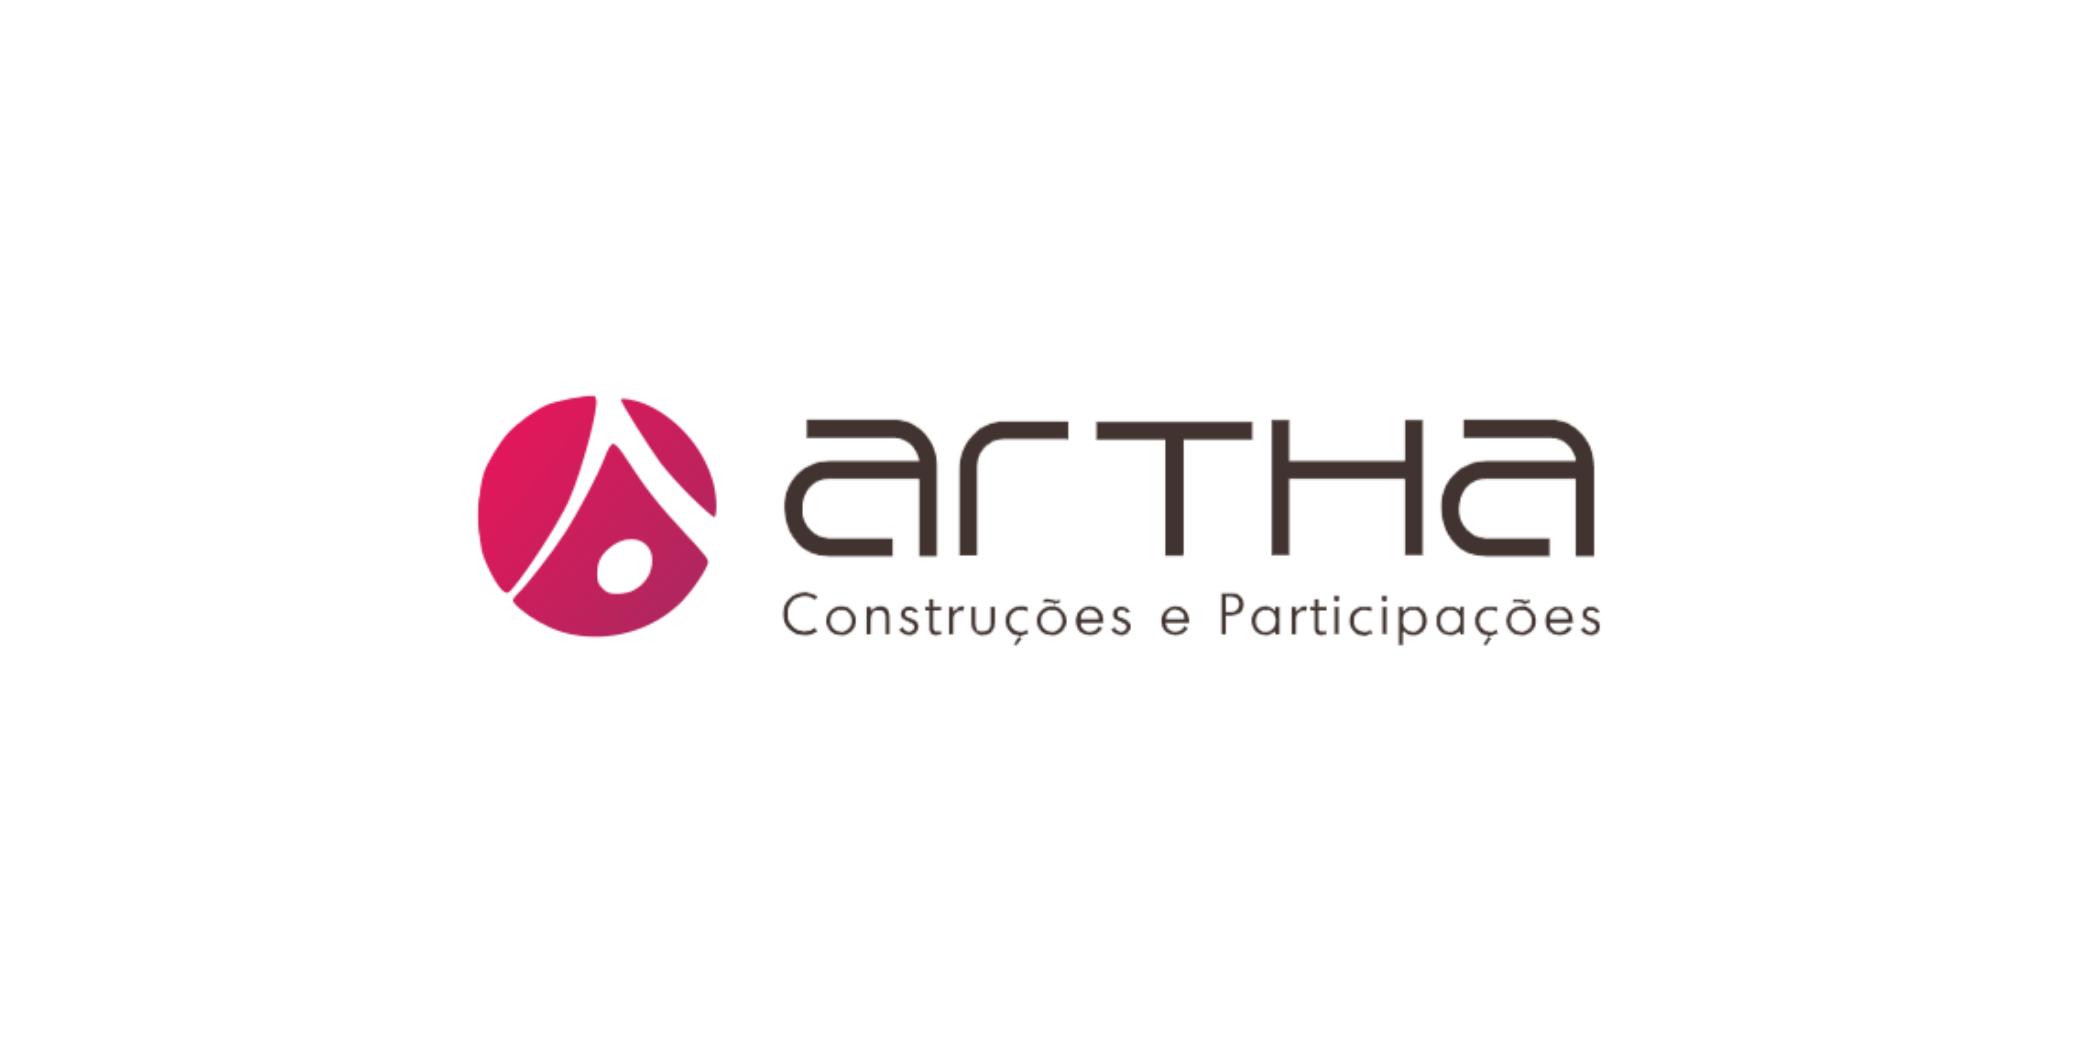 Artha-1.png